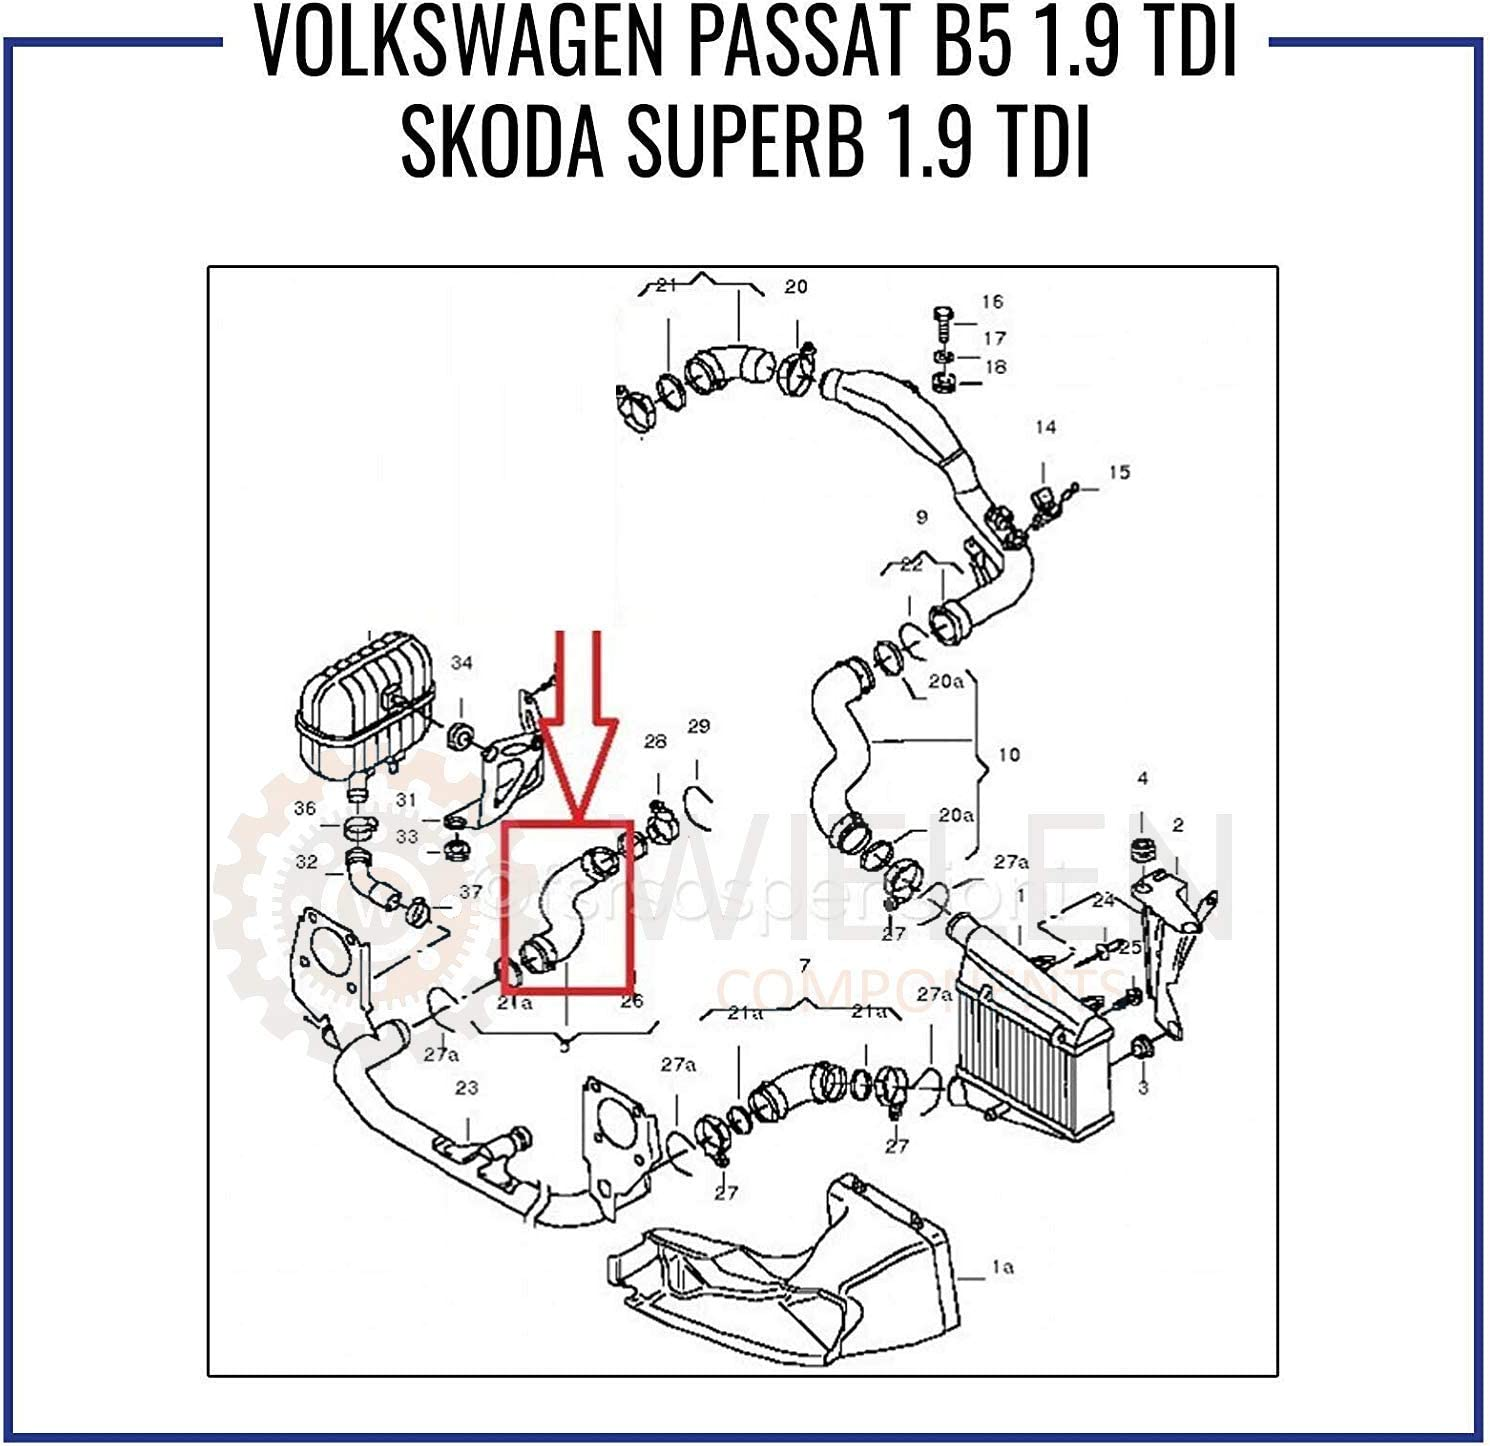 V W V O L K S W A G E N PASSAT B5 S K O D A SUPERB 1.9 TDI Manchon Intercooler Tube Air 3B0145828G 3B0145828D 3B0145828F 3B0145828K